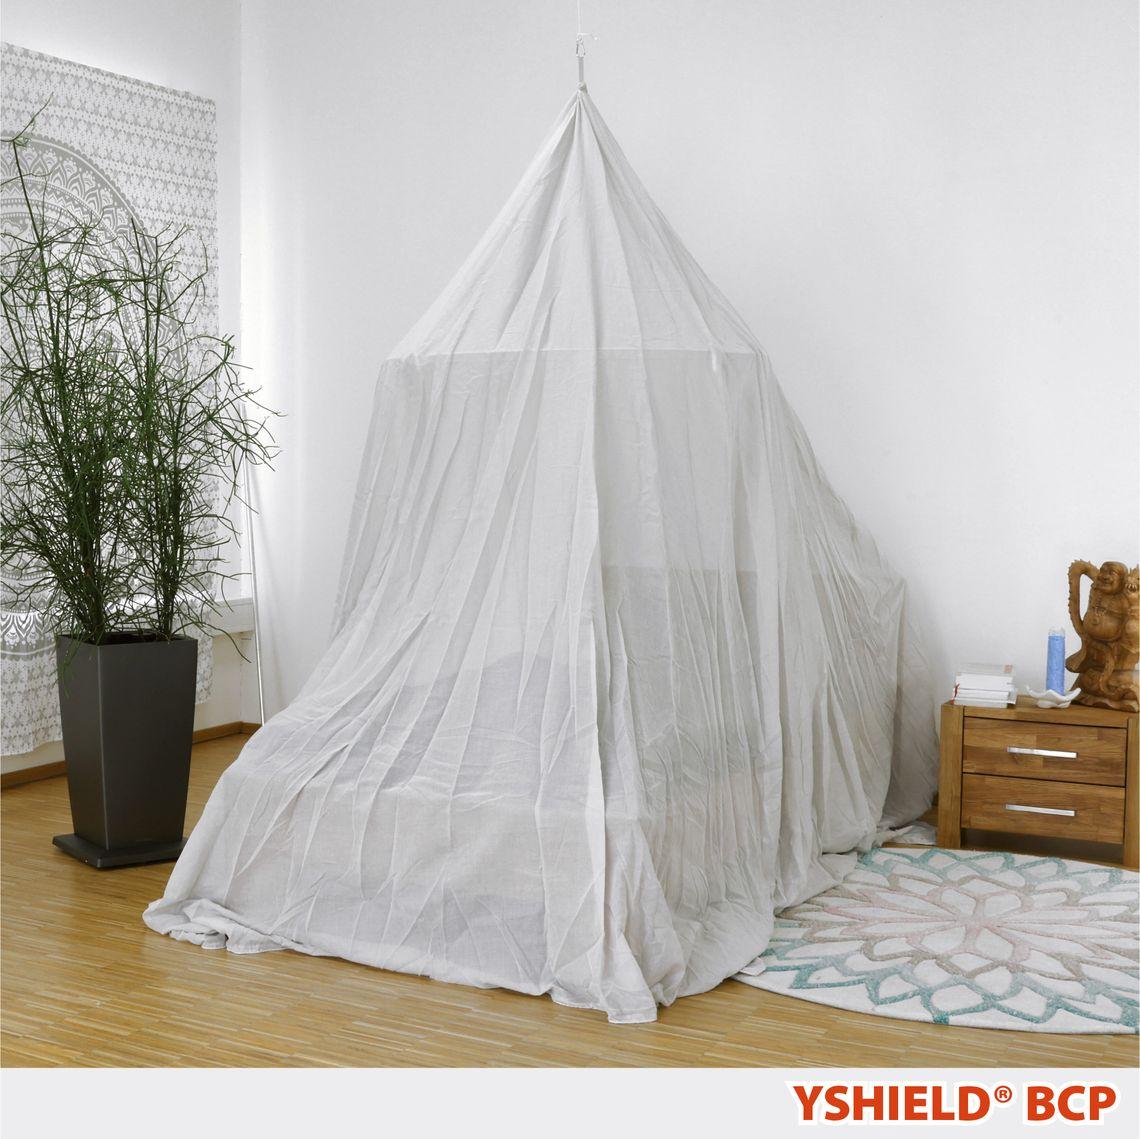 YSHIELD® BCP | Abschirmbaldachin | Pyramide | SILVER-COTTON